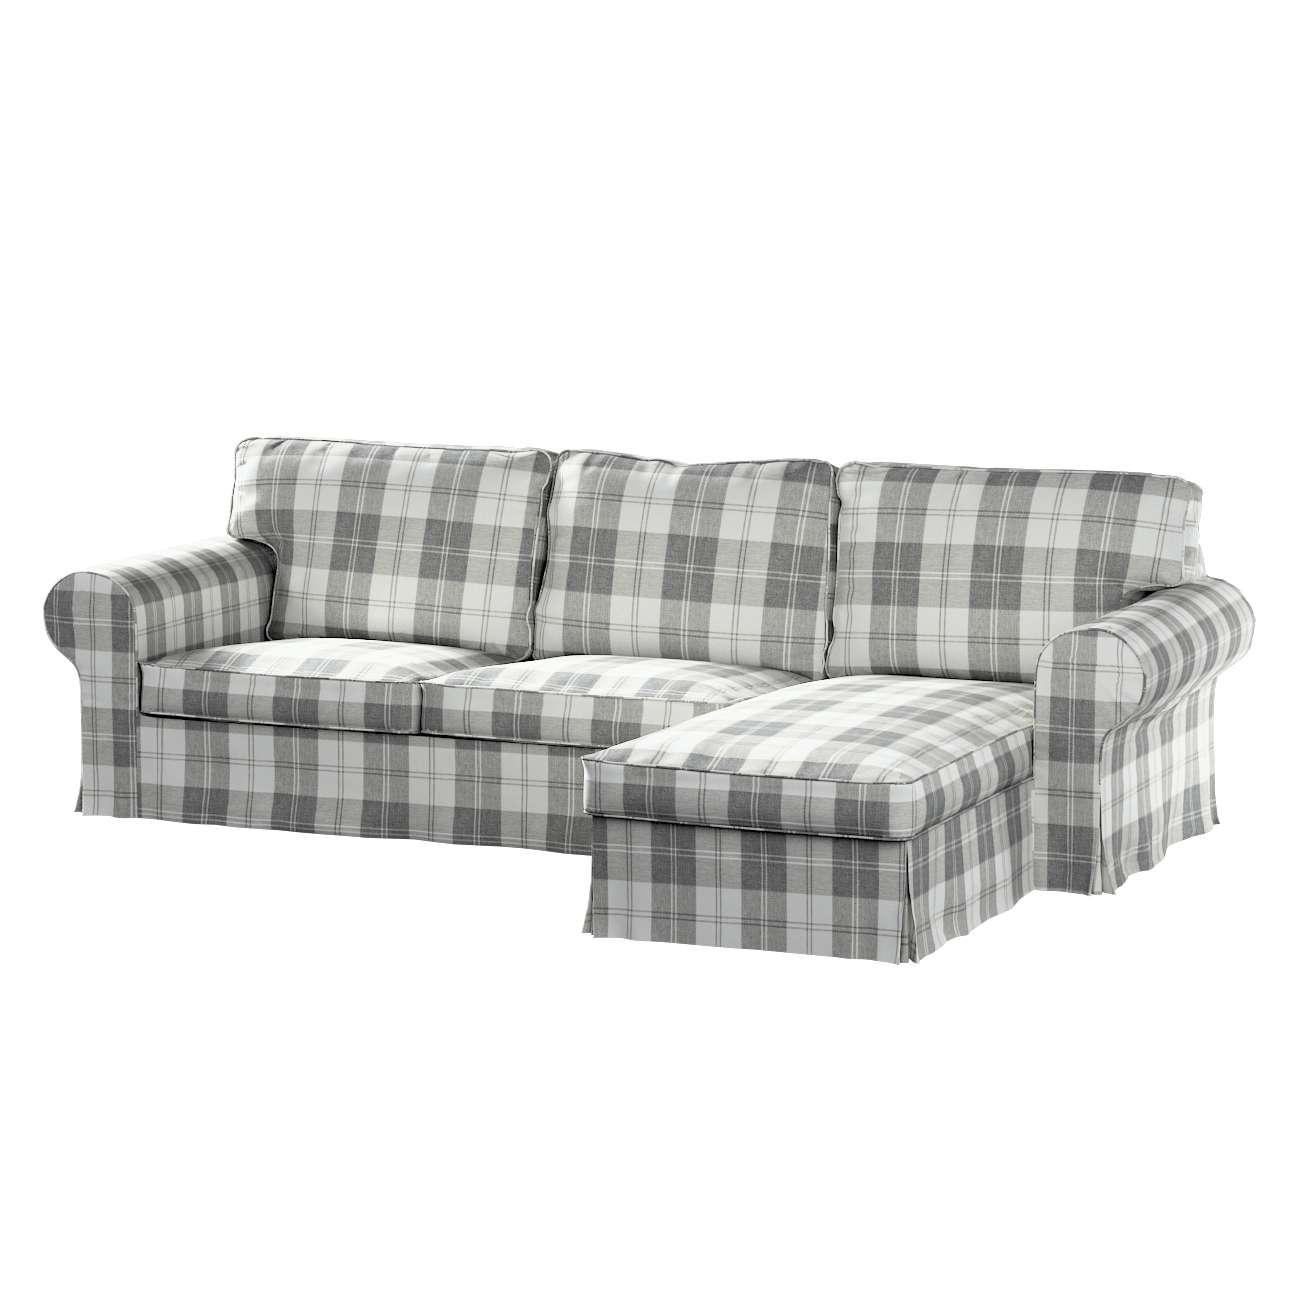 Potah na pohovku IKEA Ektorp 2-místná se šezlongem sofa ektorp 2-0s. i leżanka v kolekci Edinburgh, látka: 115-79